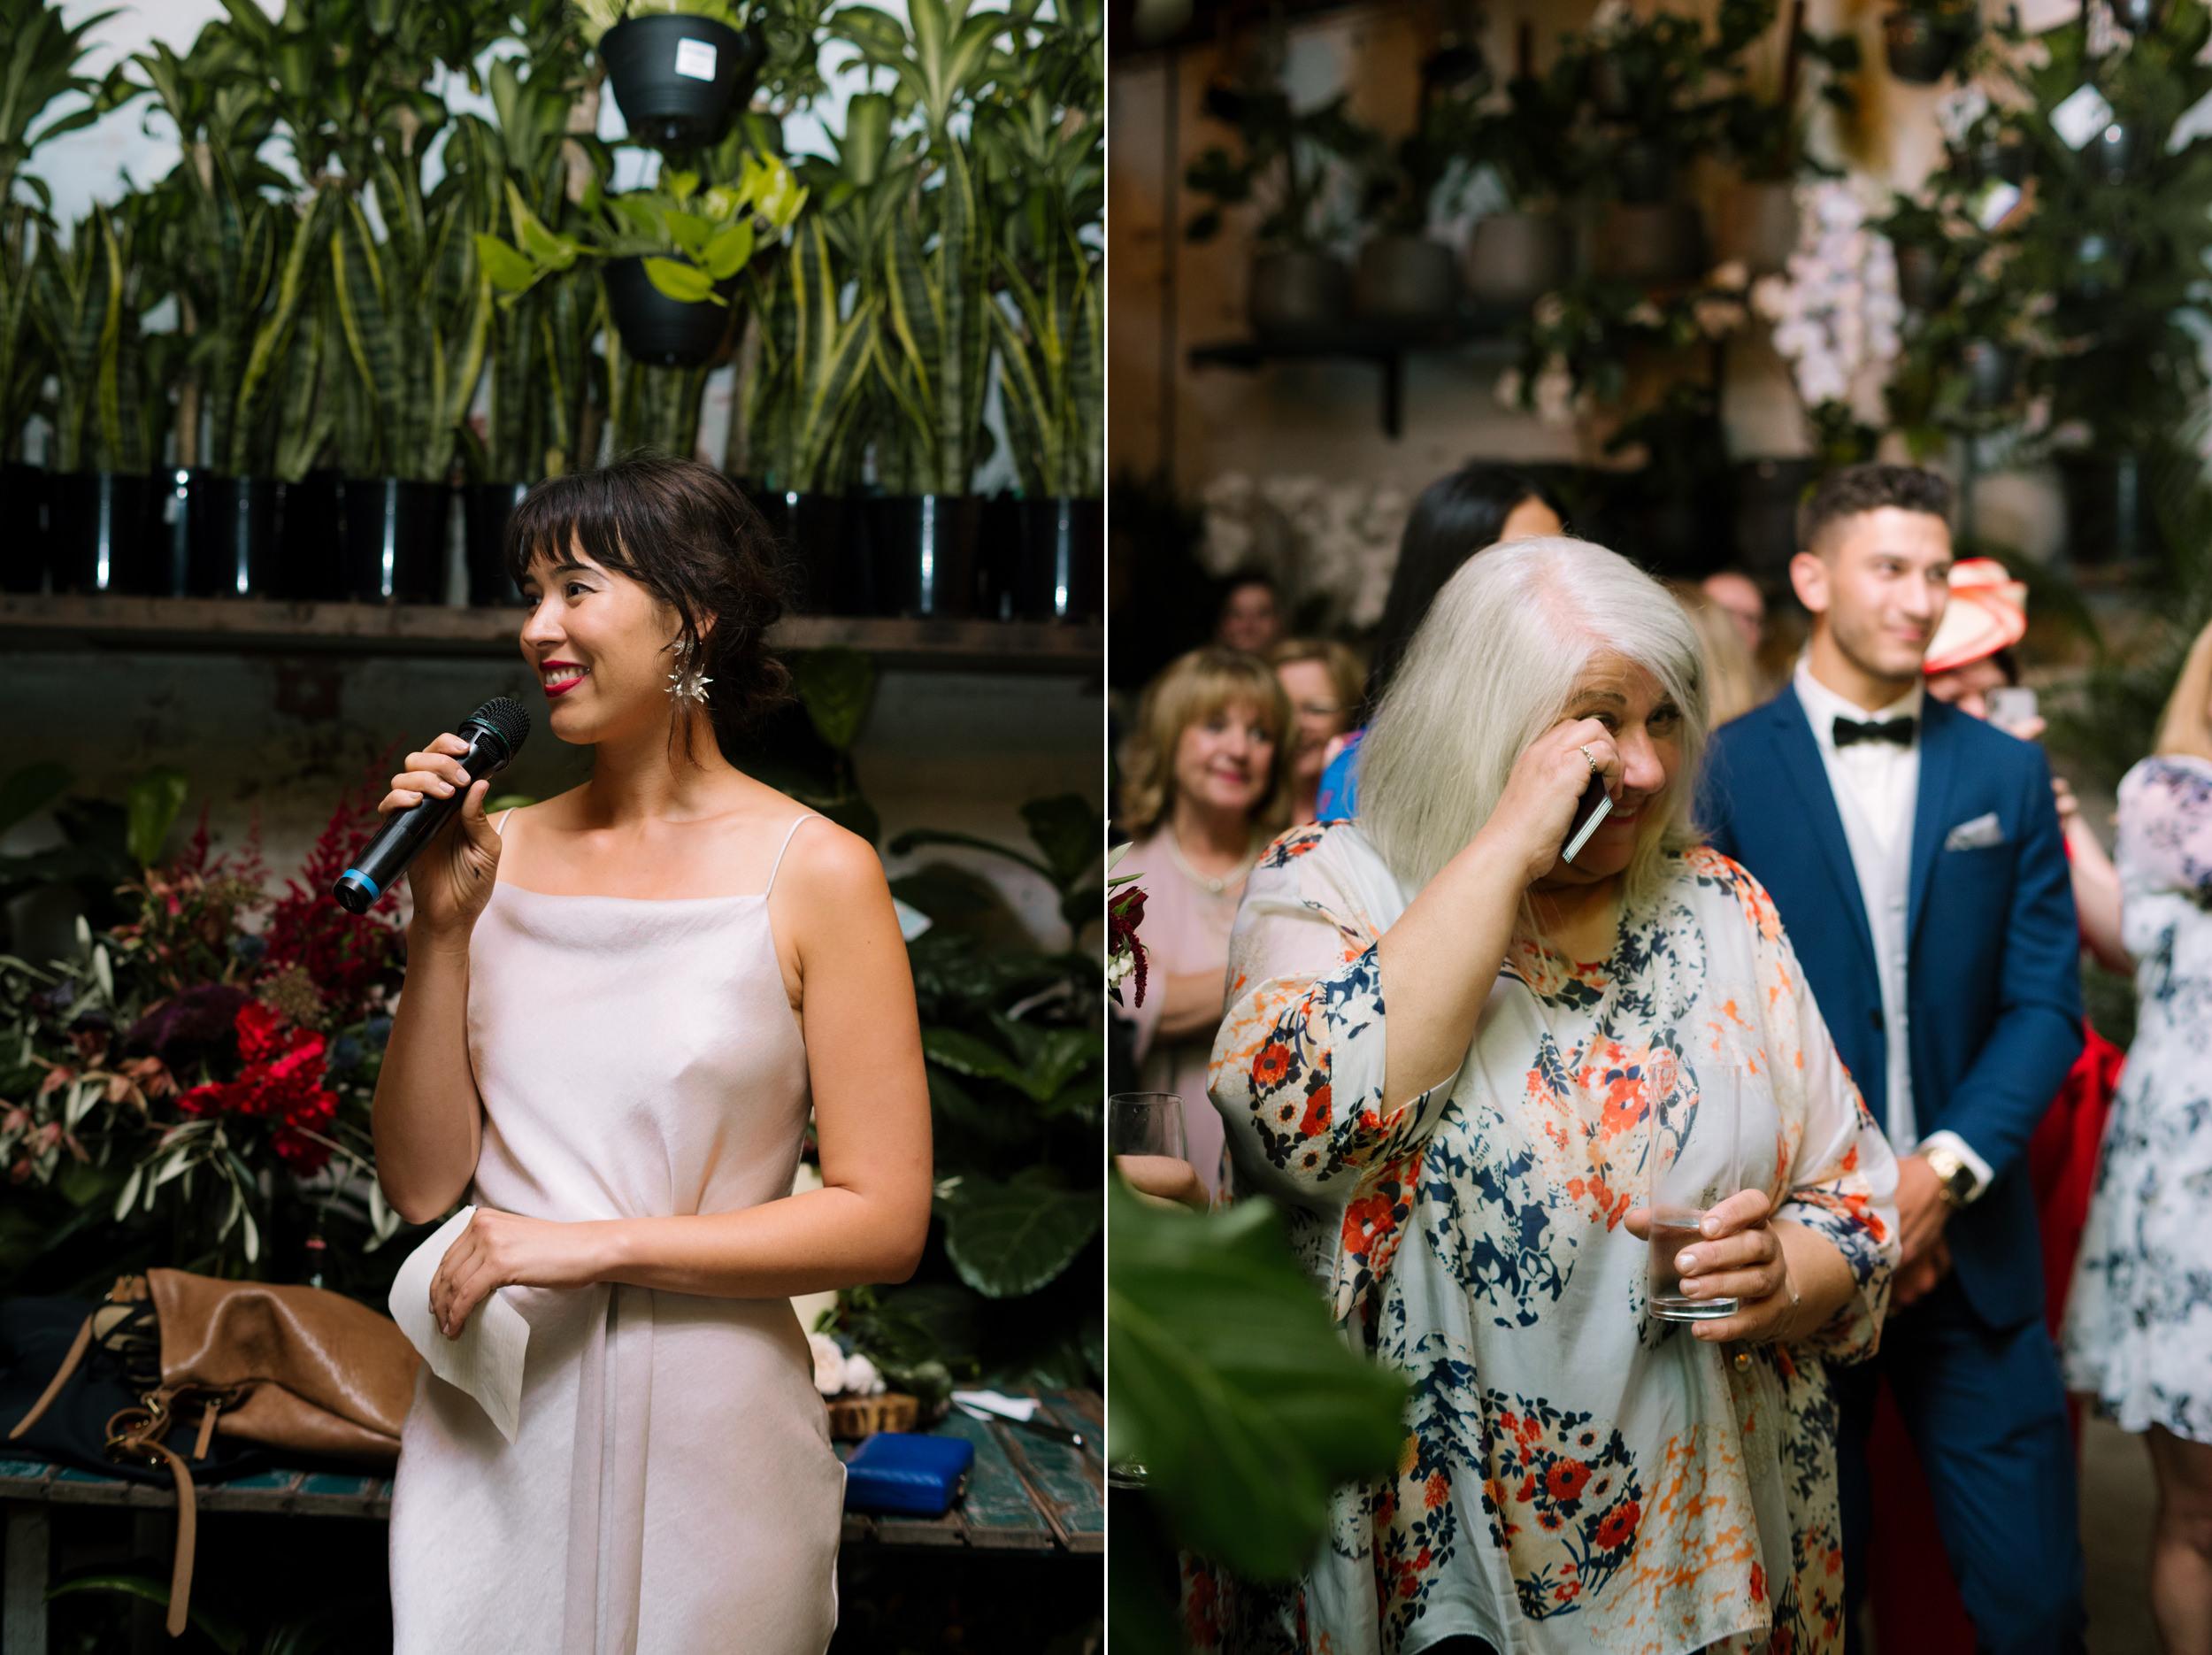 I-Got-You-Babe-&.Co.-Glasshaus-Wedding-Charlotte-Cameron0130.JPG